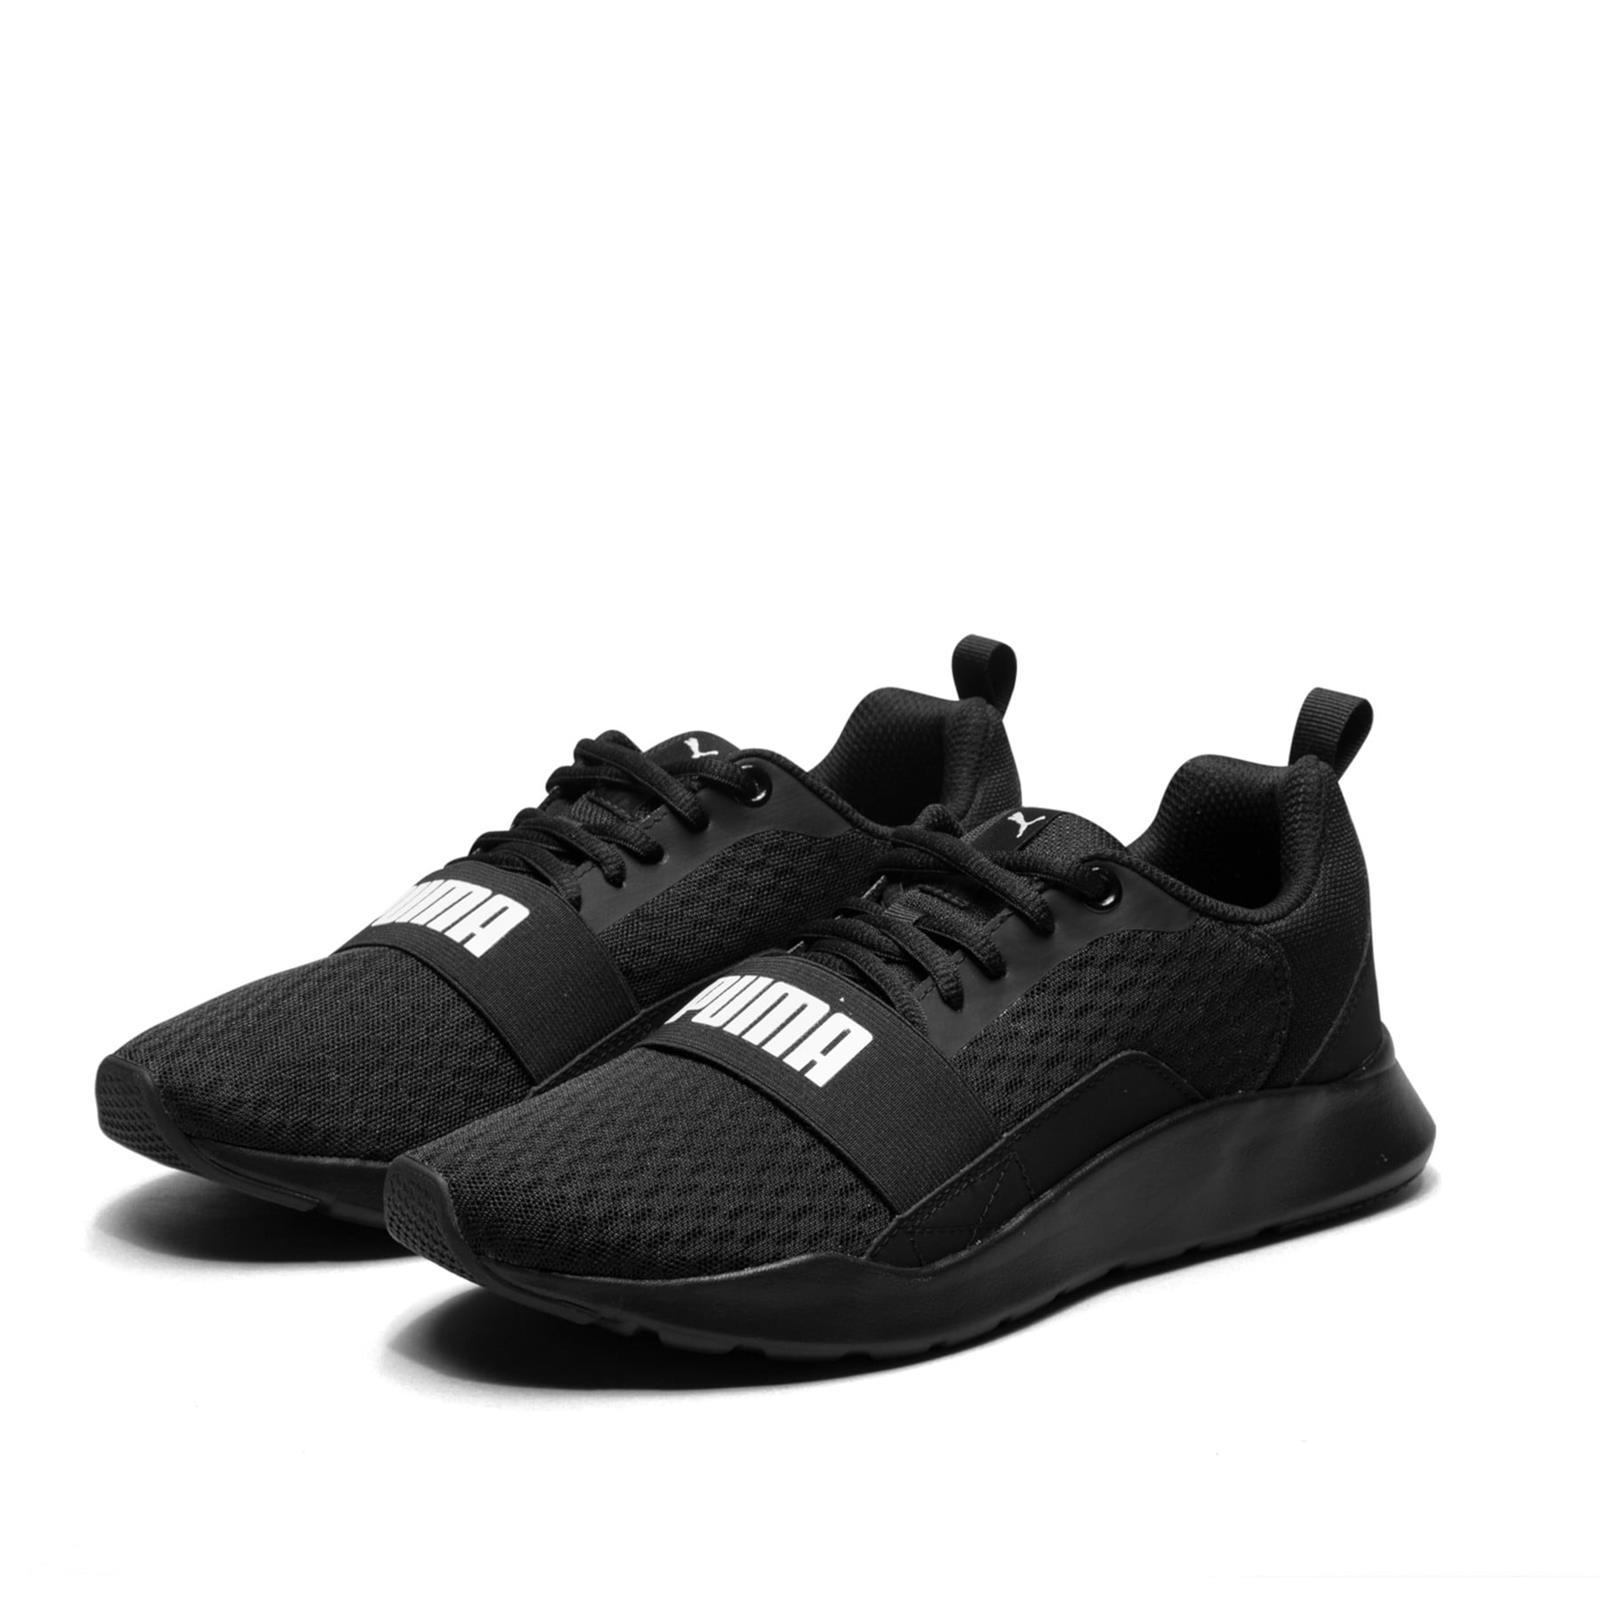 Buty Puma Wired 36697001